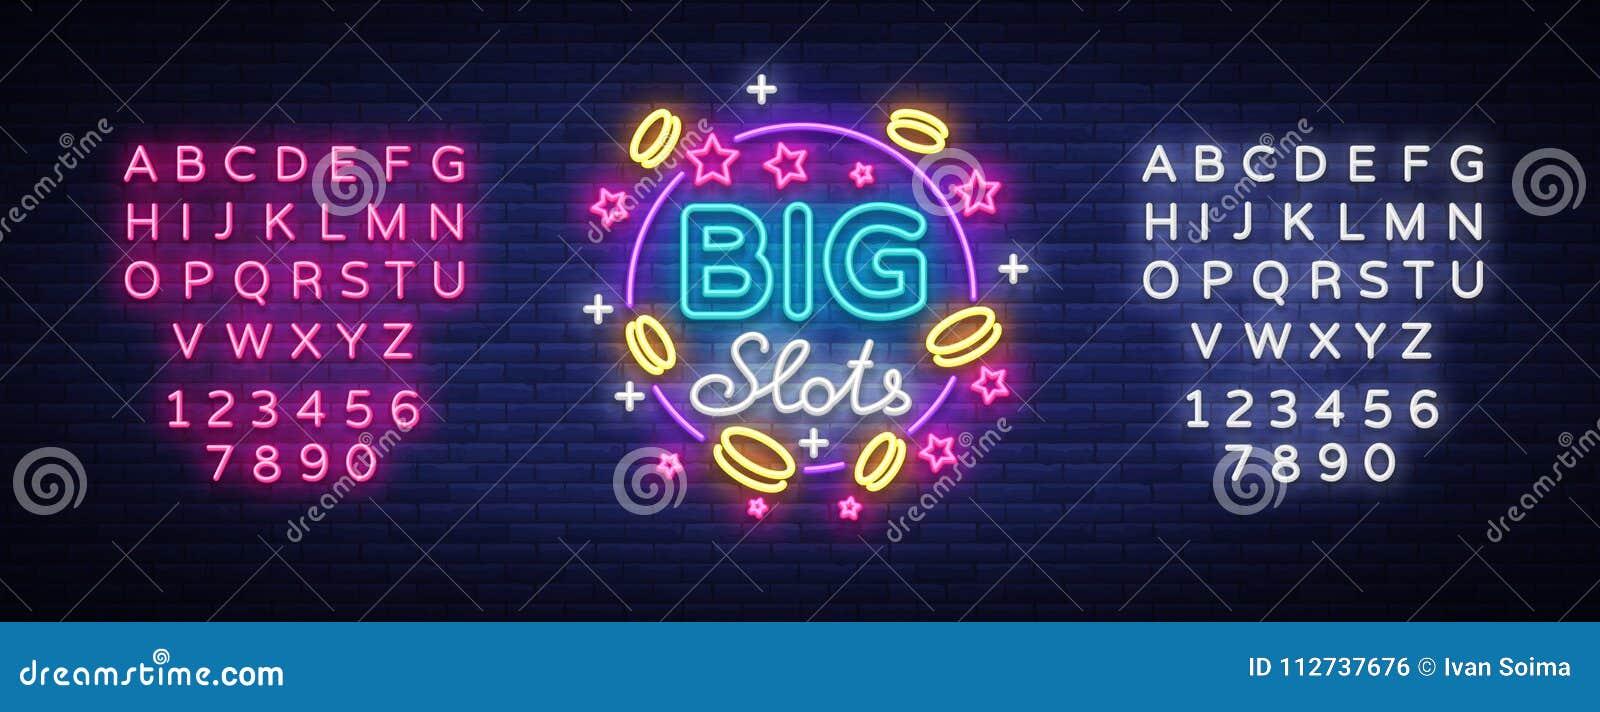 Big slots neon sign. Design template in neon style. Slot Machines Light Logo Symbol, Winning Jackpot, Luminous Web